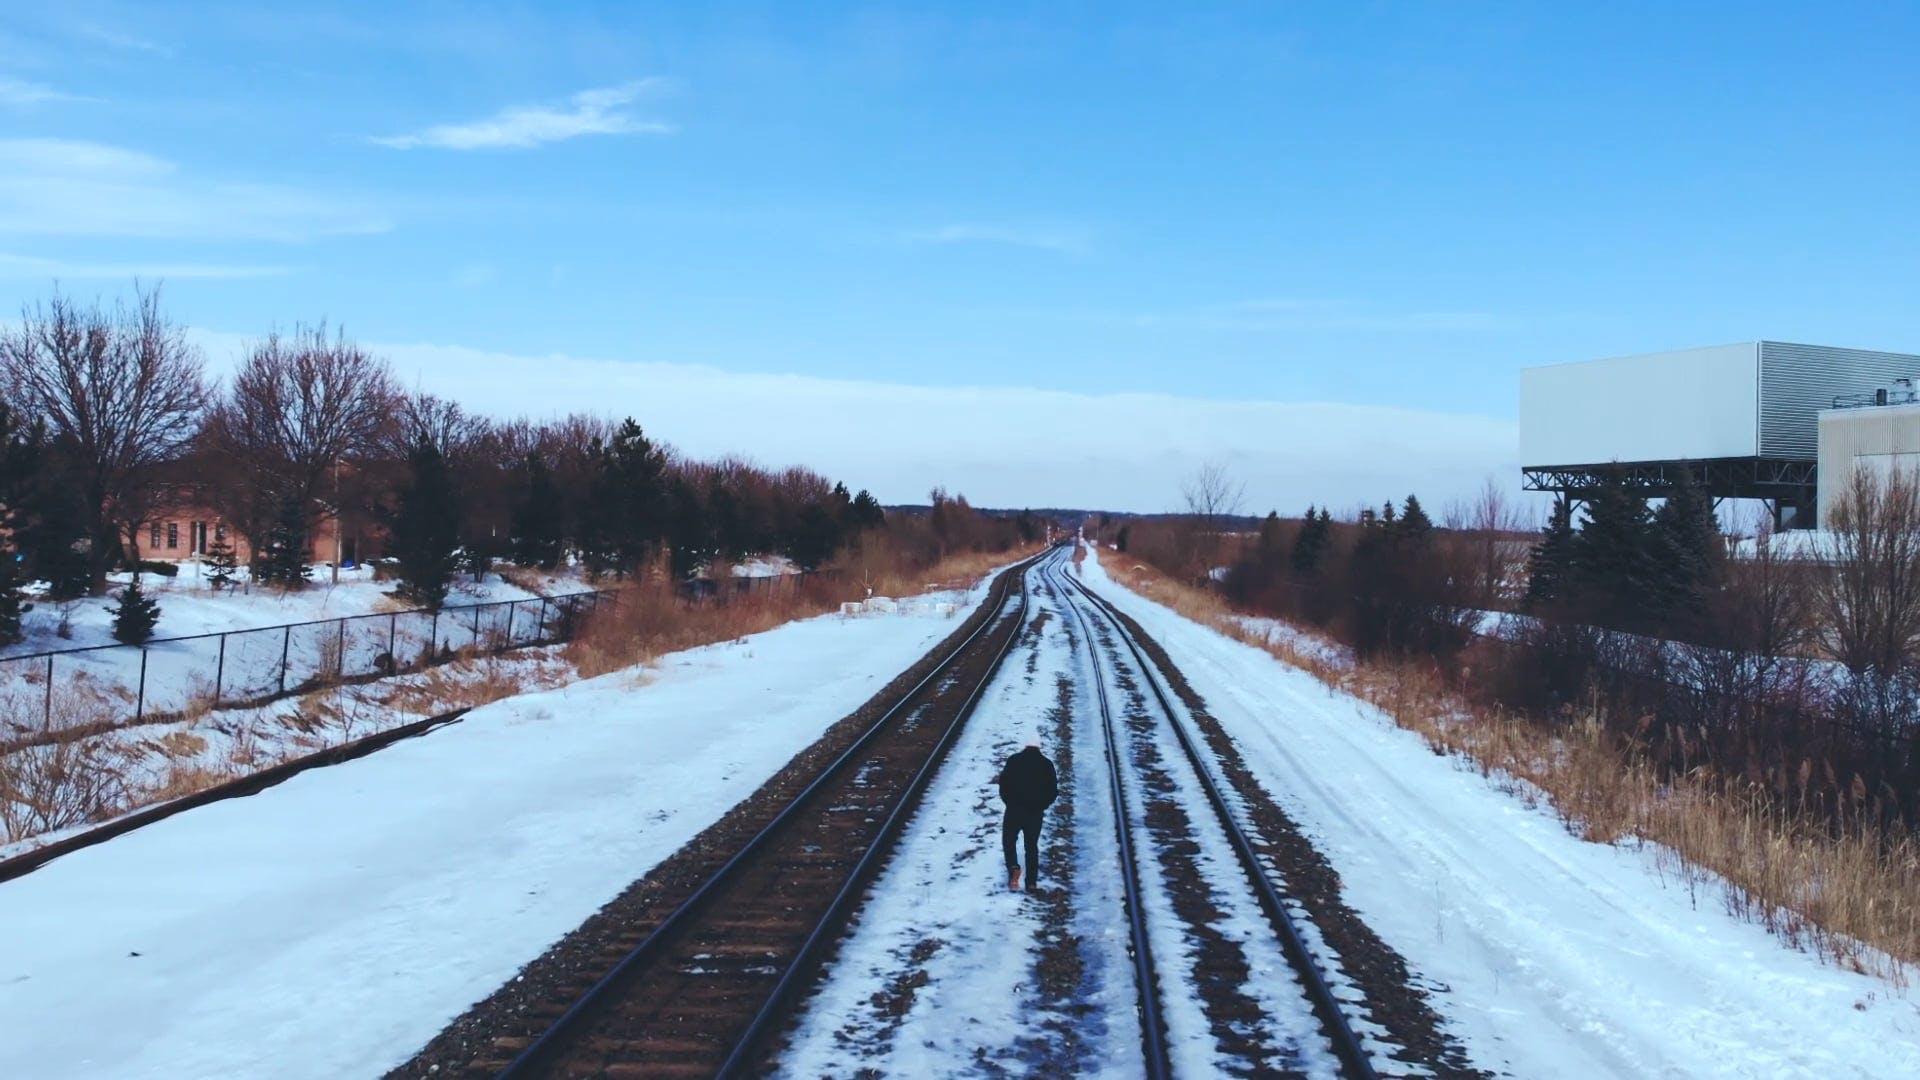 Photo of Man Walking On Railroad During Winter